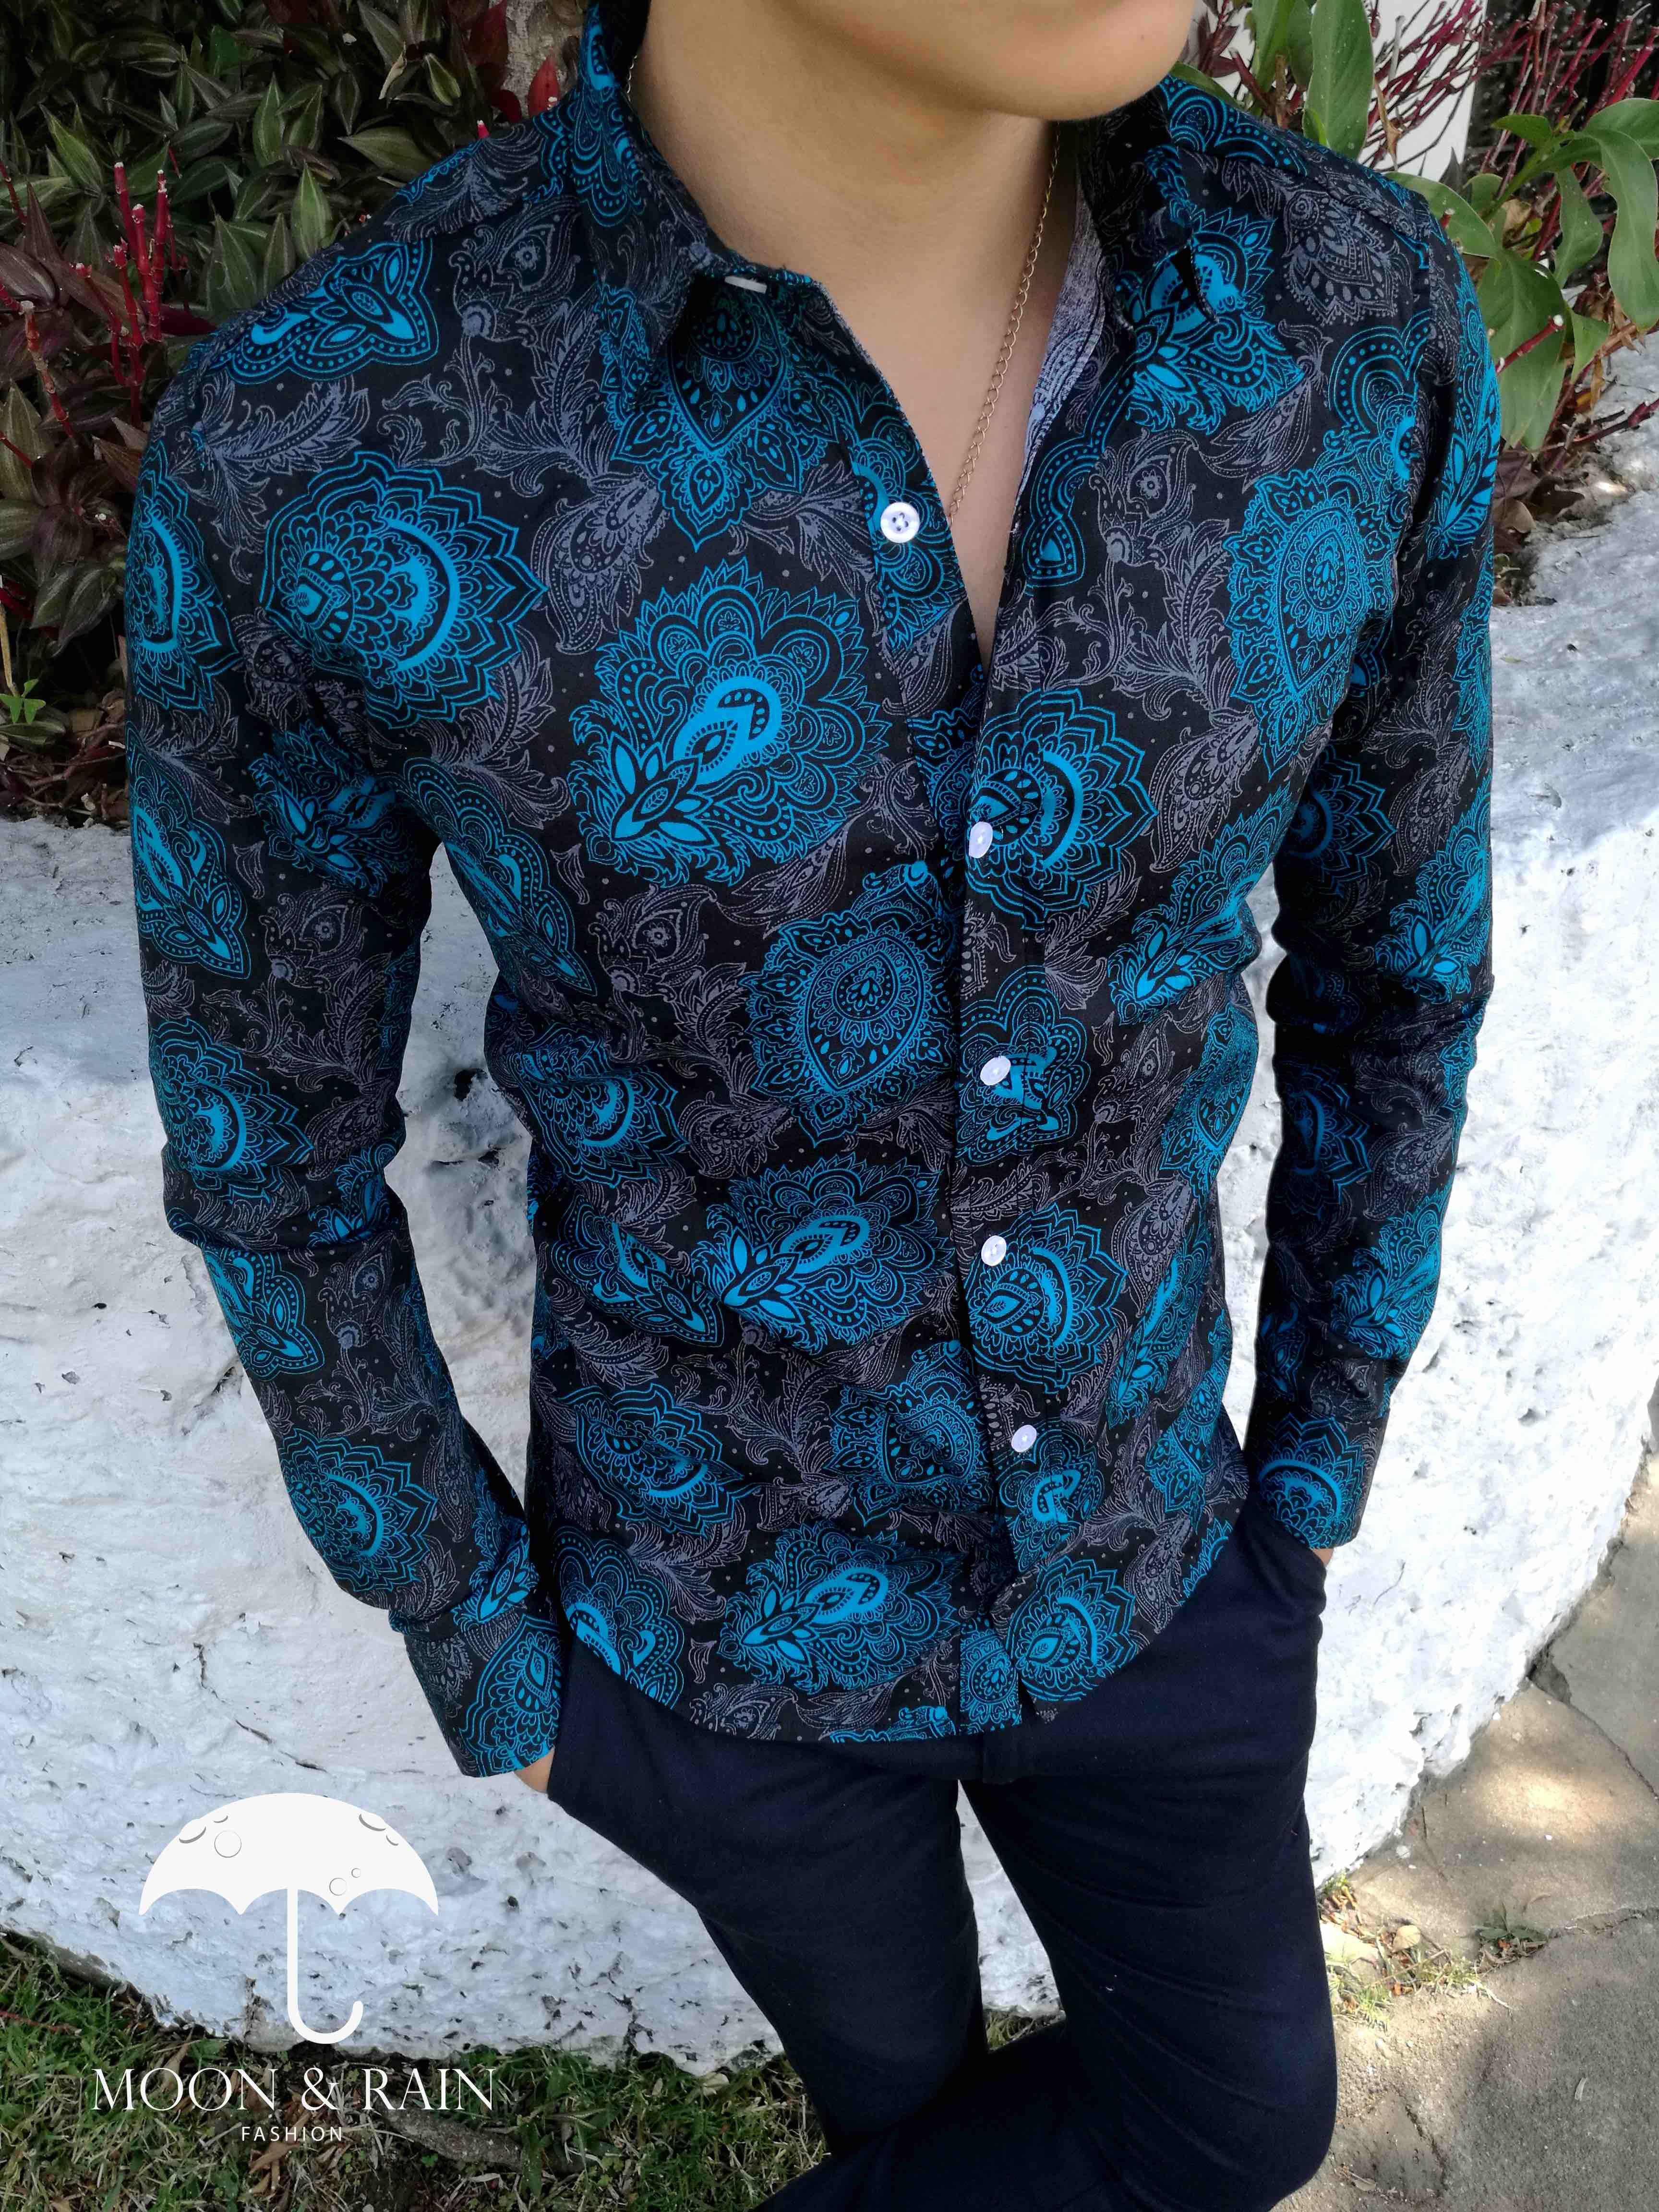 Camisa Negra De Flores Aqua Para Hombre Tiendas Platino Moda Ropa Hombre Ropa Casual Hombres Ropa De Moda Hombre